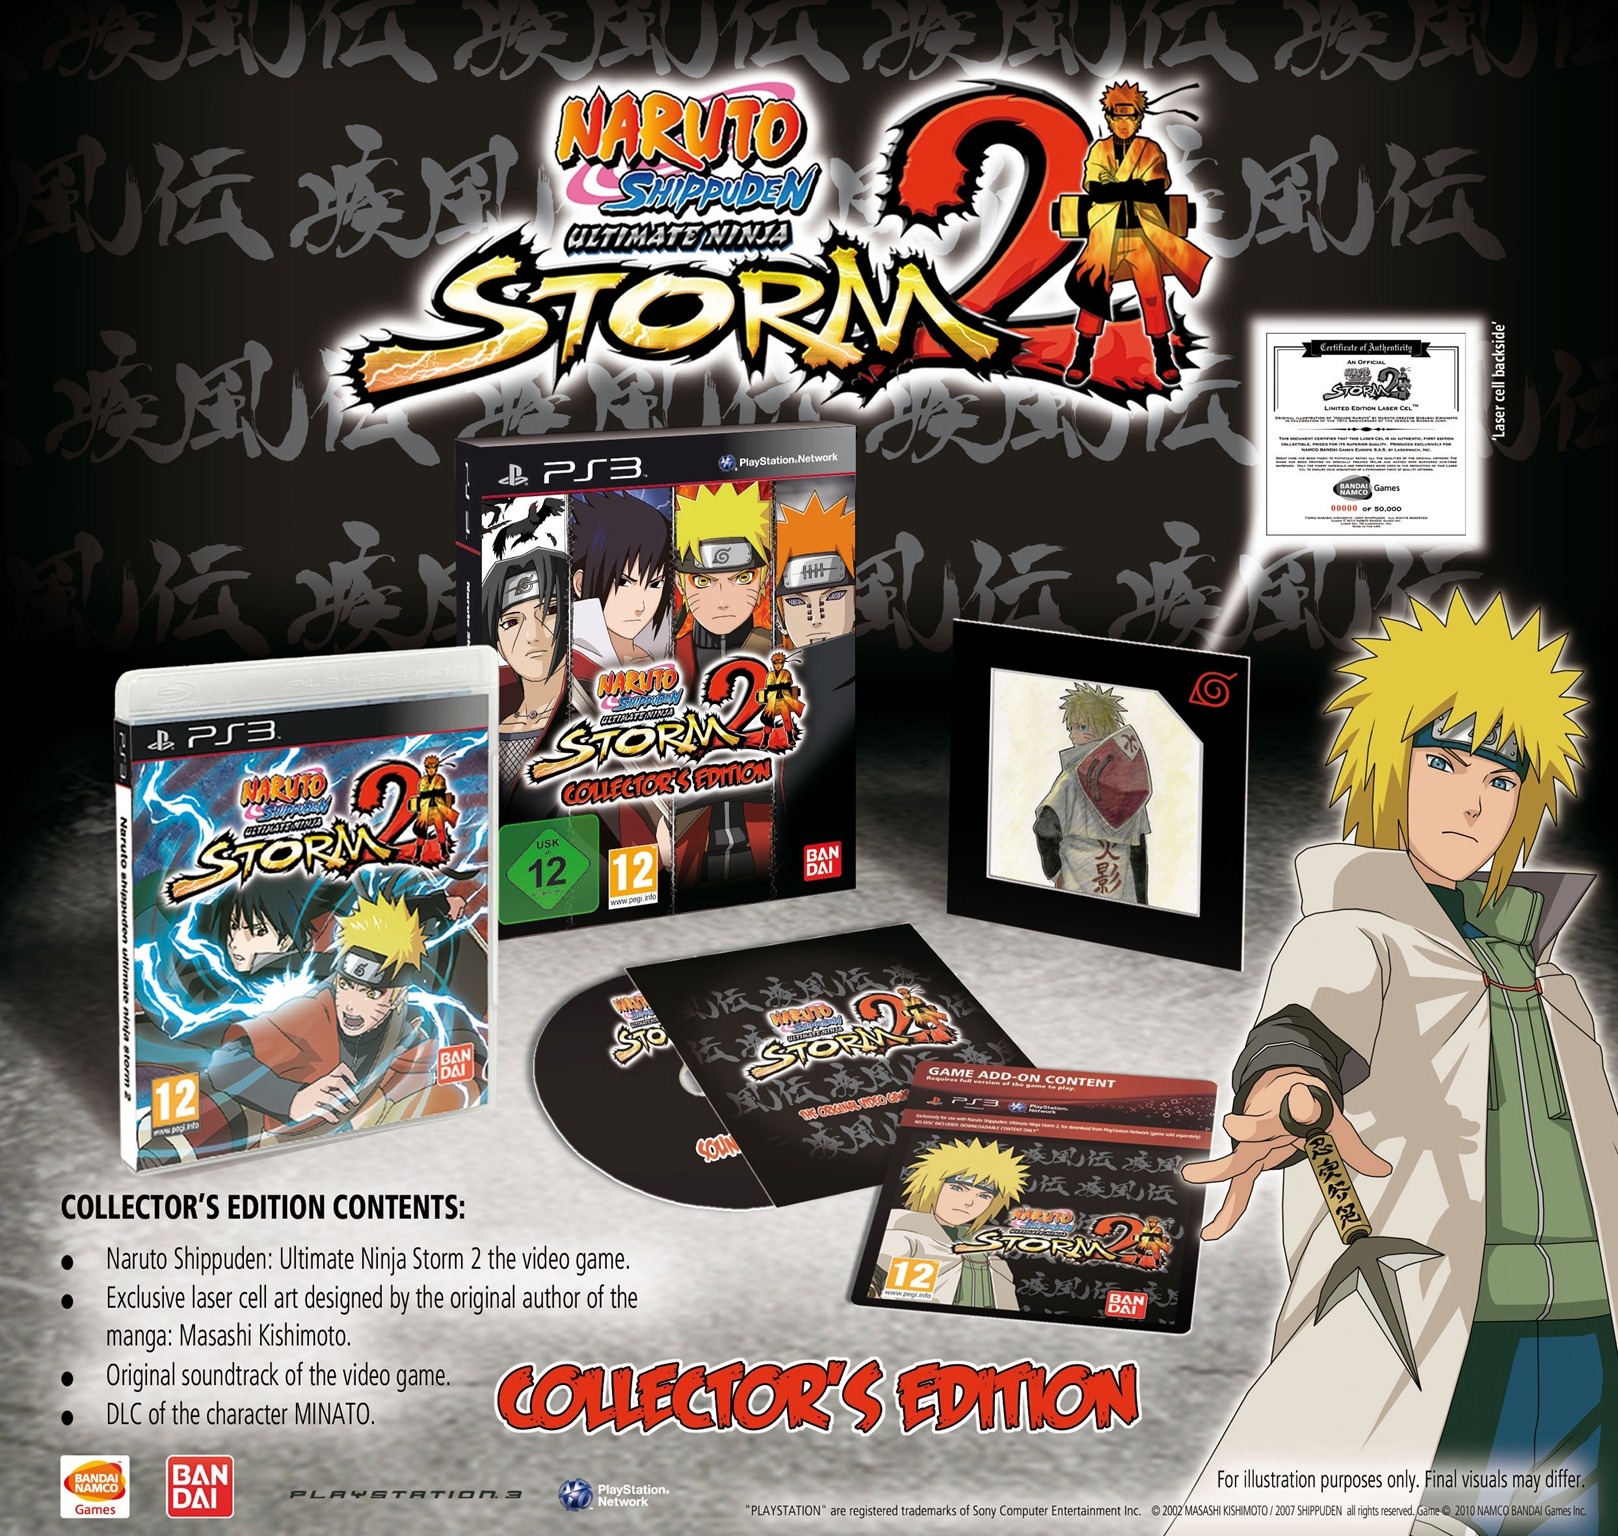 Naruto shippuden: ultimate ninja storm trilogy xbox one boxart.